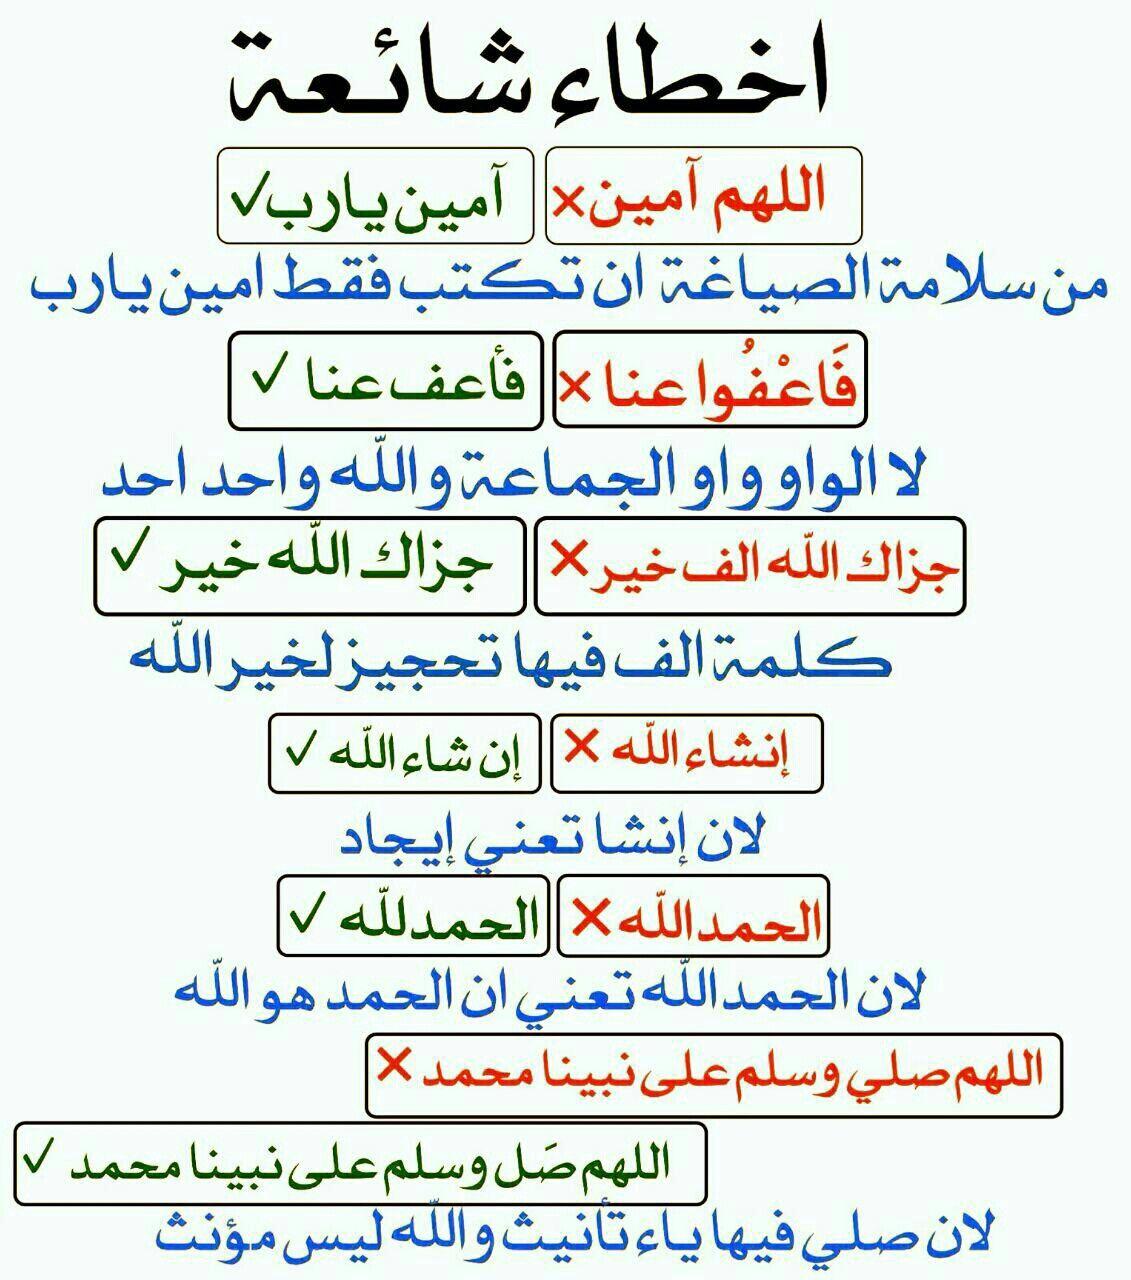 Desertrose ويبقى ذكر الل ه هو الأجمل لا إ ل ه إ ل ا الل ه م ح م د ر س ول الل ه ال له Quran Quotes Learn Quran Islamic Inspirational Quotes